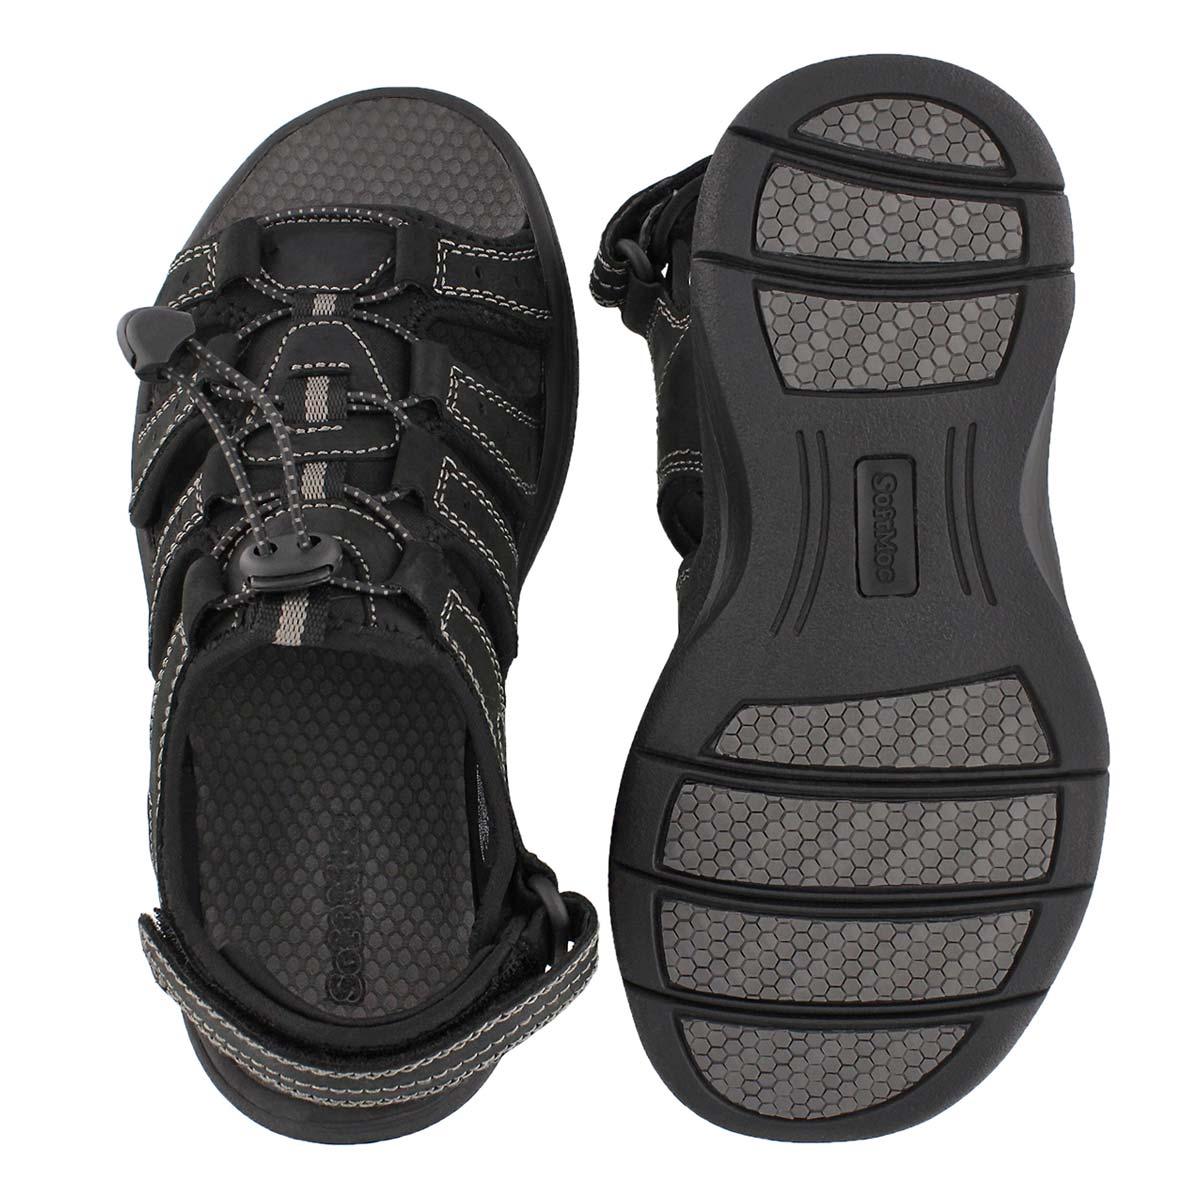 Mns Lazar black sport sandal